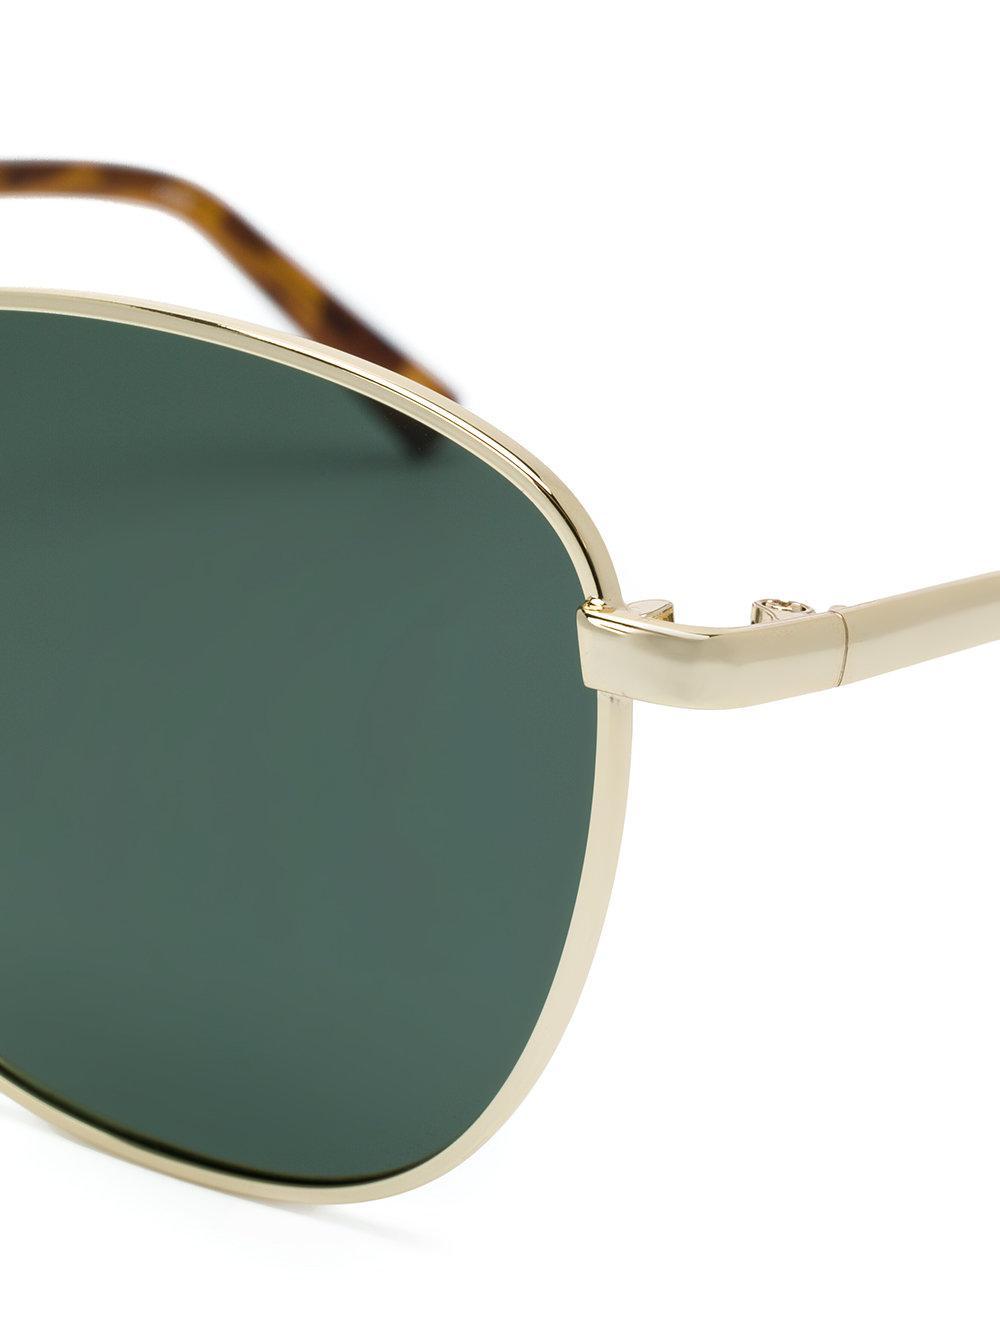 Le Specs Sunglasseses With Khaki Mono Polarized Lens in Metallic - Lyst 022c57bdbbd1d